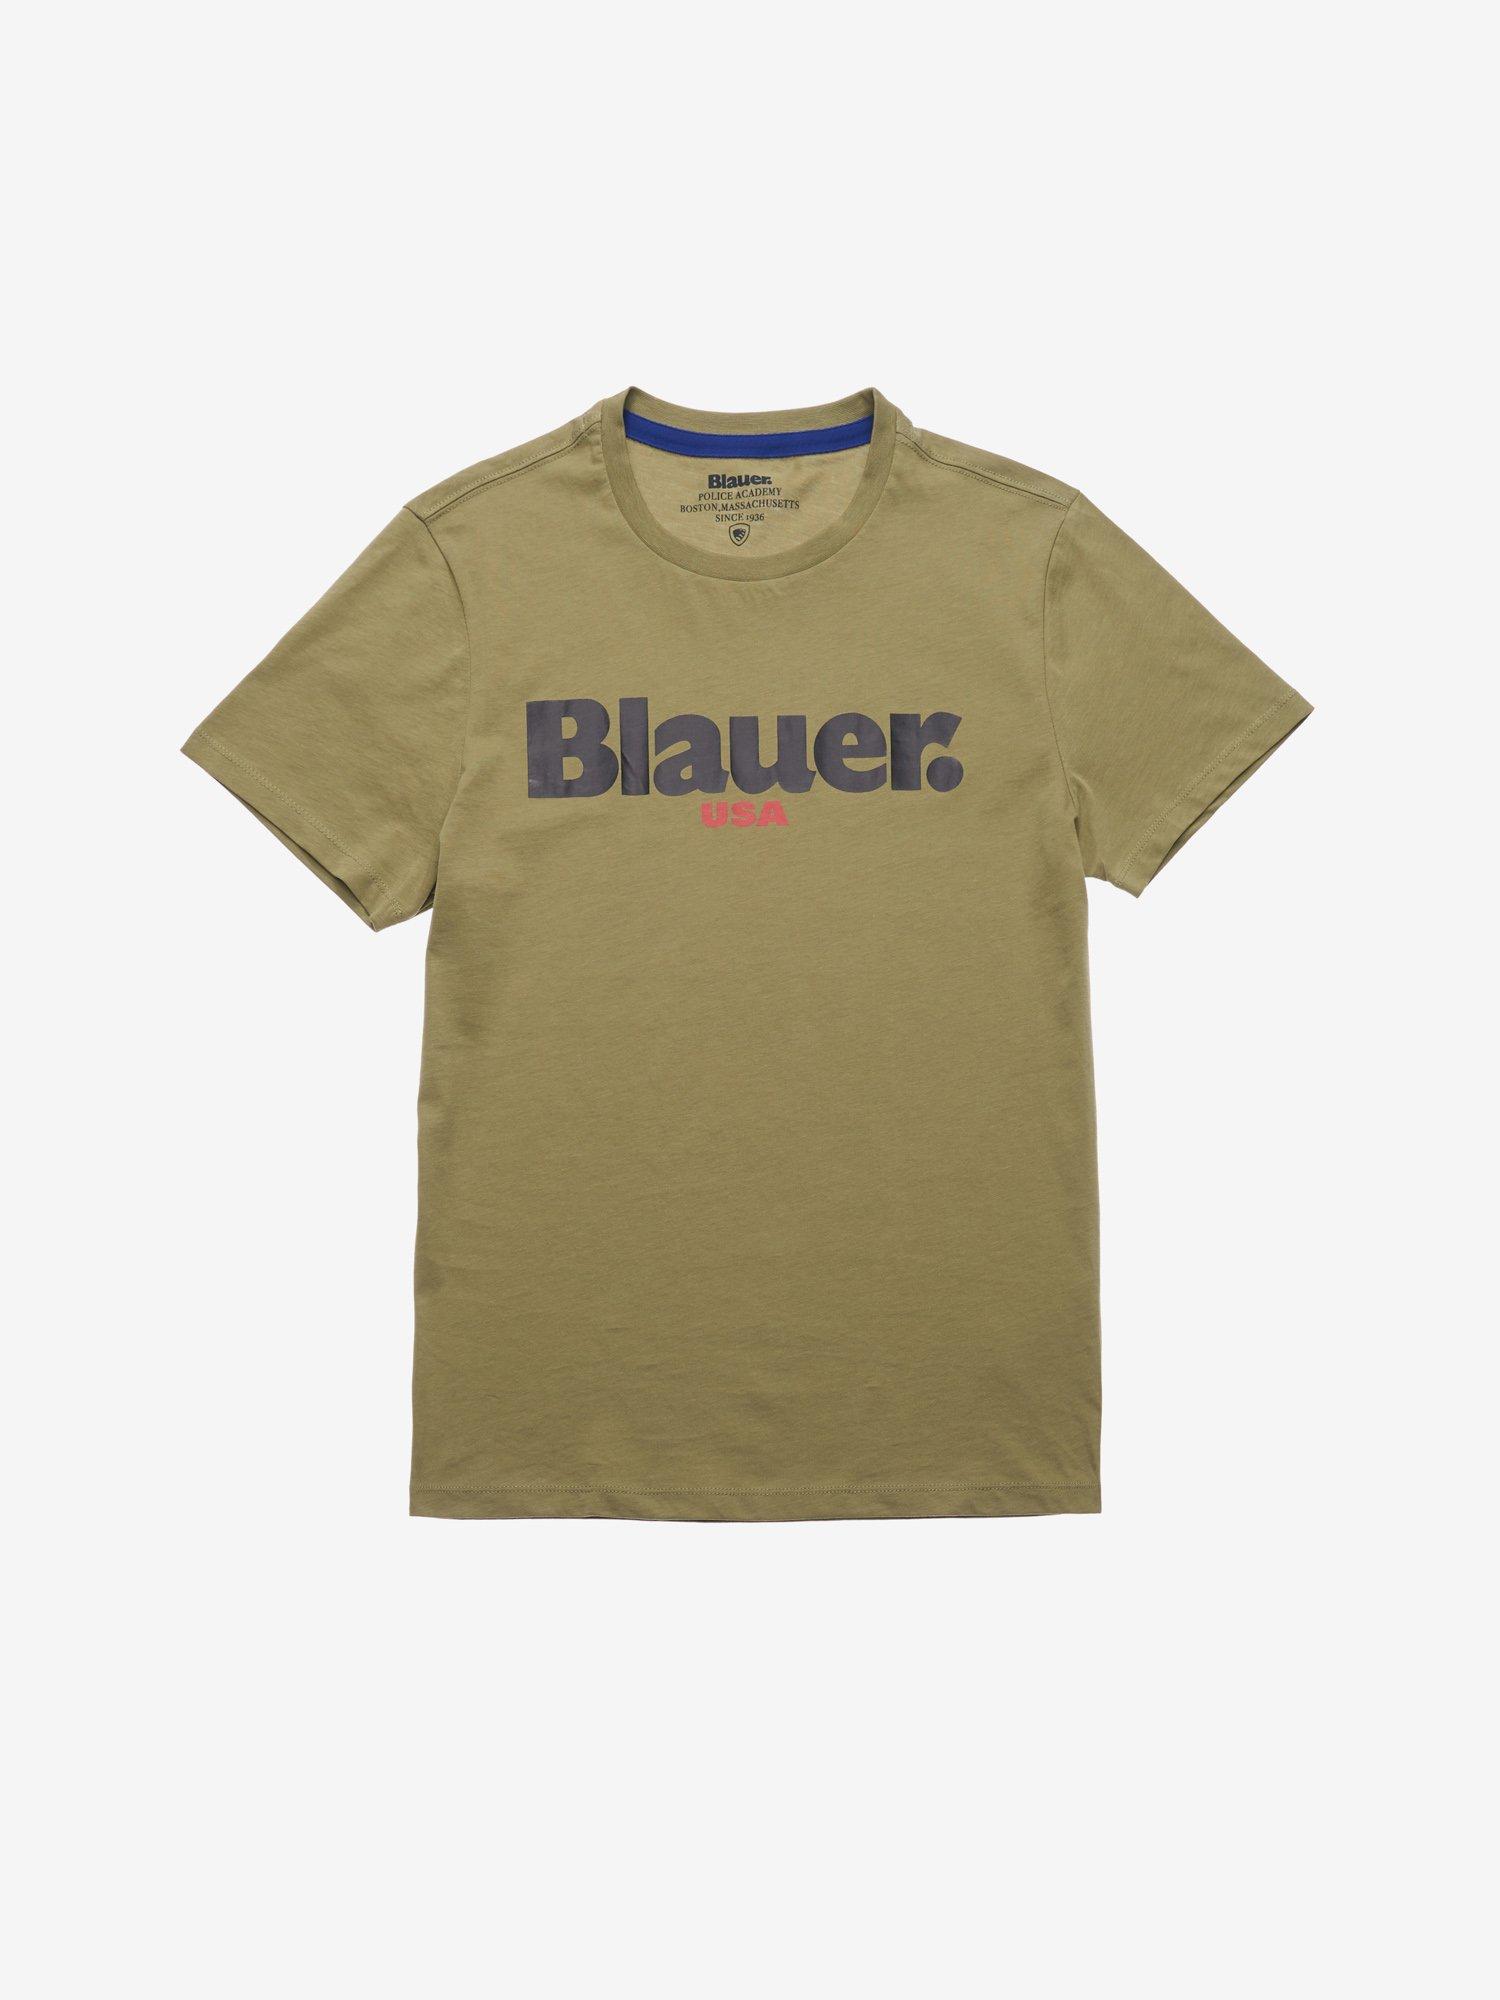 Blauer - MEN'S BLAUER USA T-SHIRT - Dusty Green - Blauer